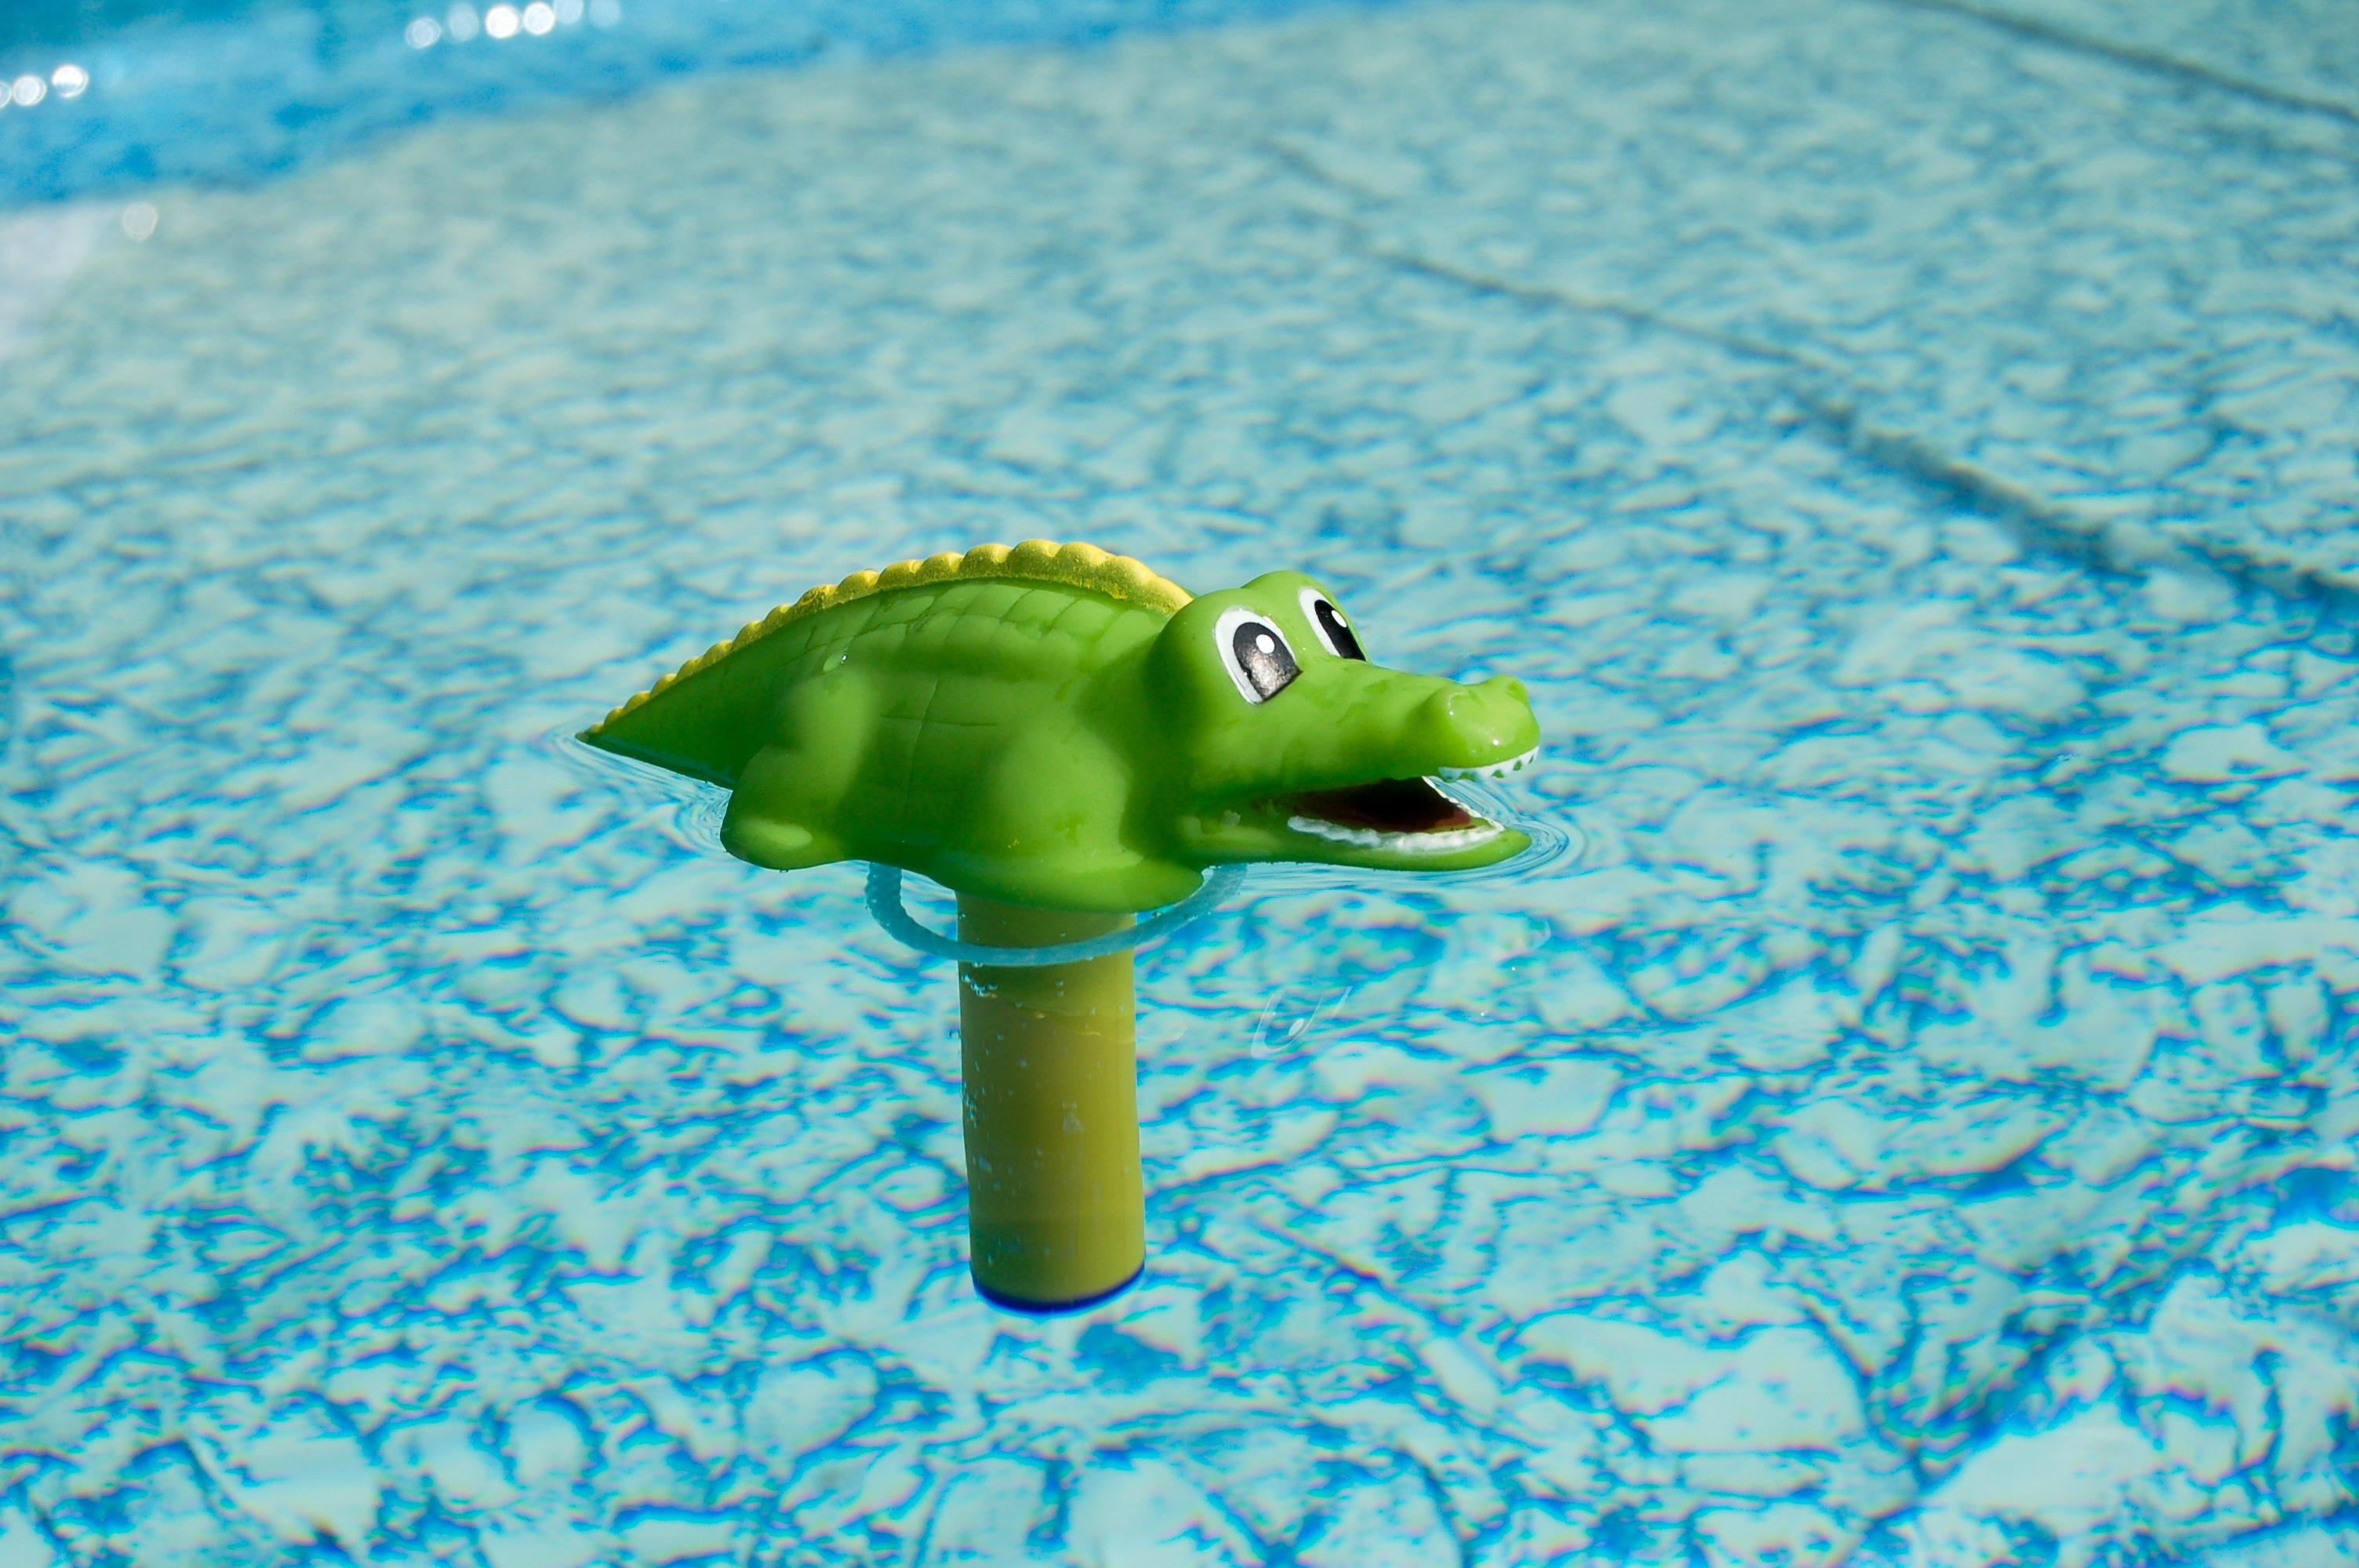 Gambar Hijau Kolam Renang Reptil Mainan Buaya Termometer